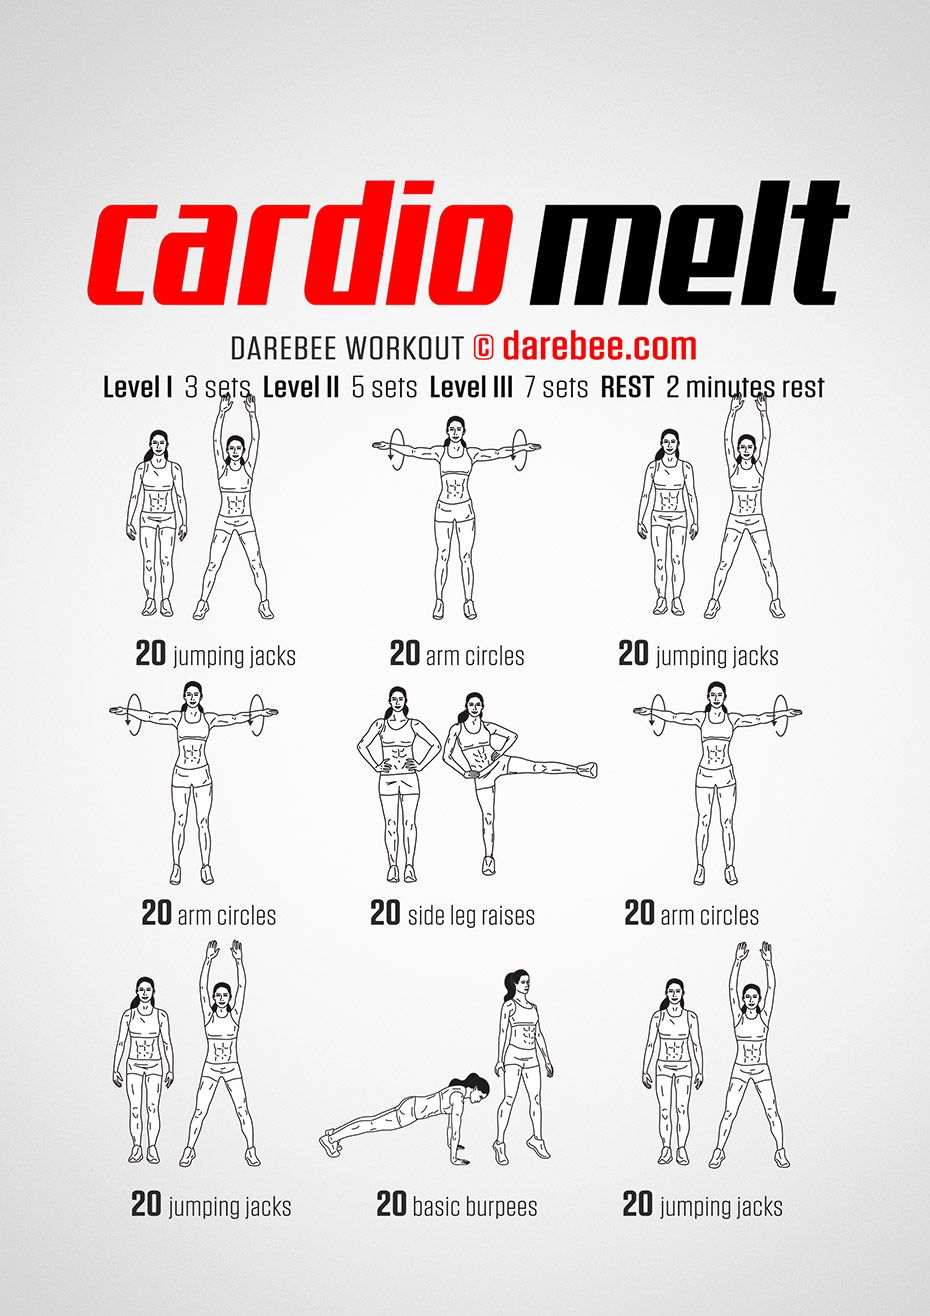 new workout cardio melt workout darebee workout fitness darebee pinterest. Black Bedroom Furniture Sets. Home Design Ideas